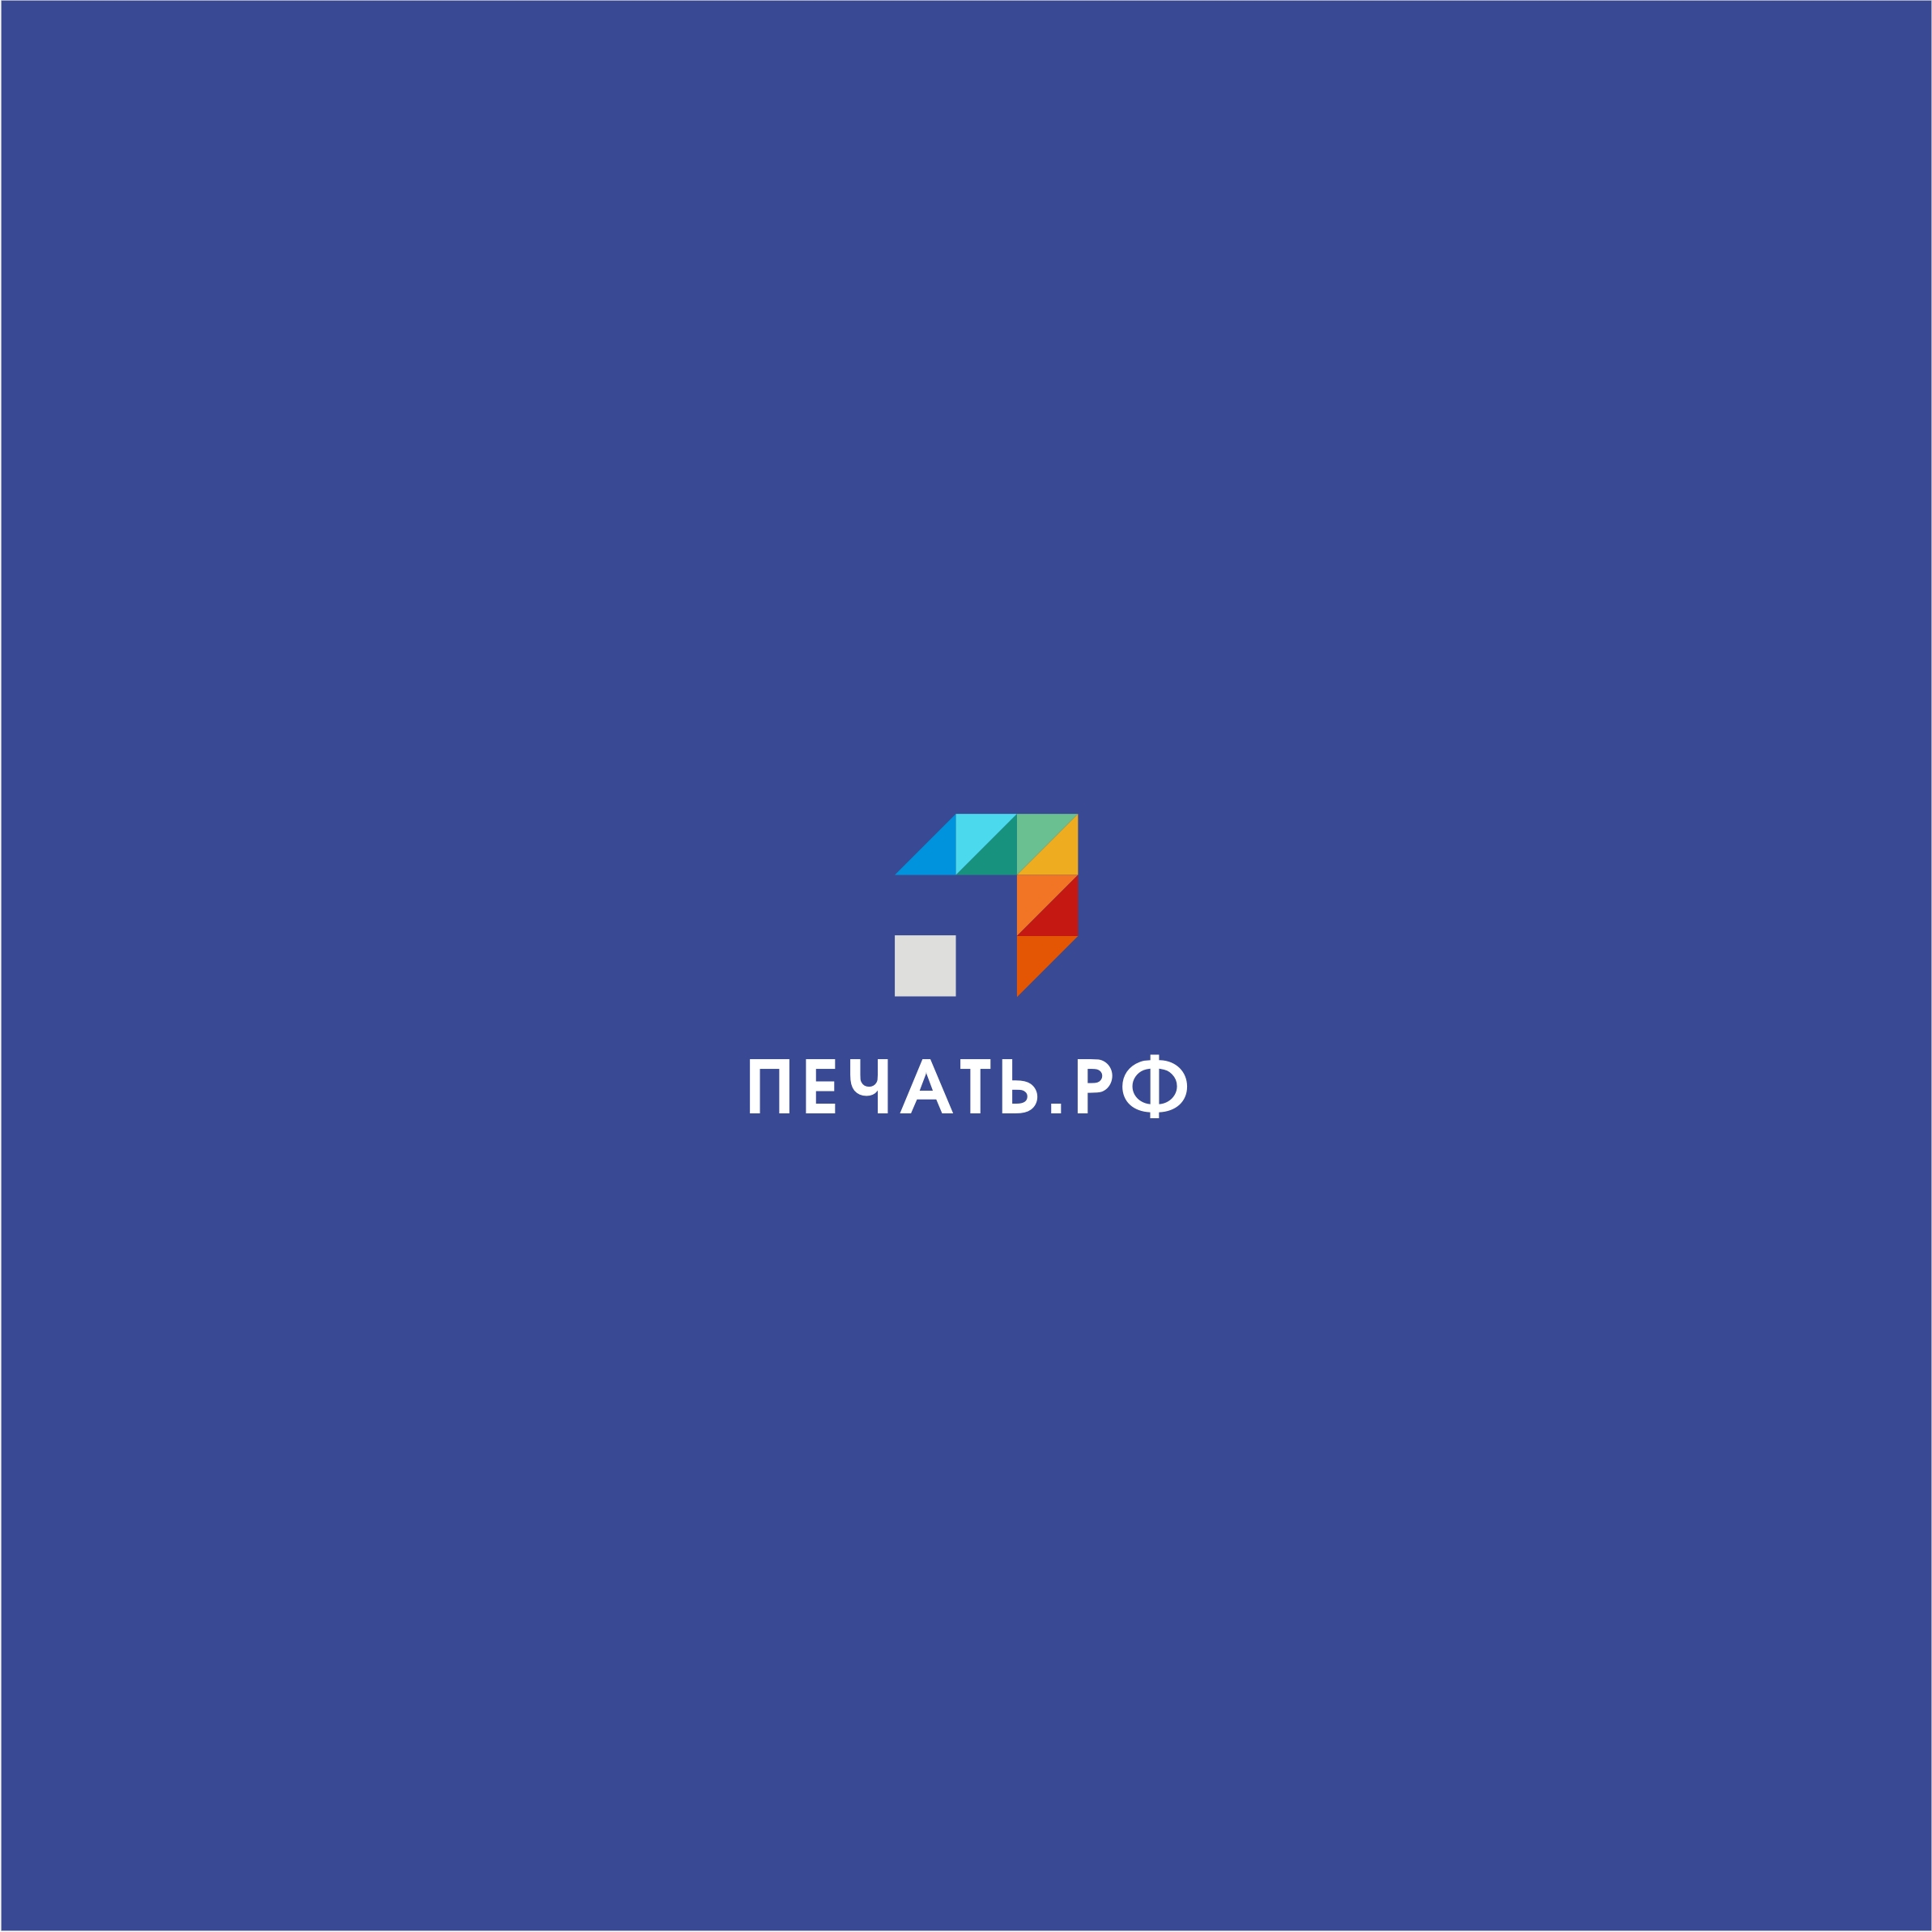 Логотип для веб-сервиса интерьерной печати и оперативной пол фото f_4945d2c67d9093bd.jpg